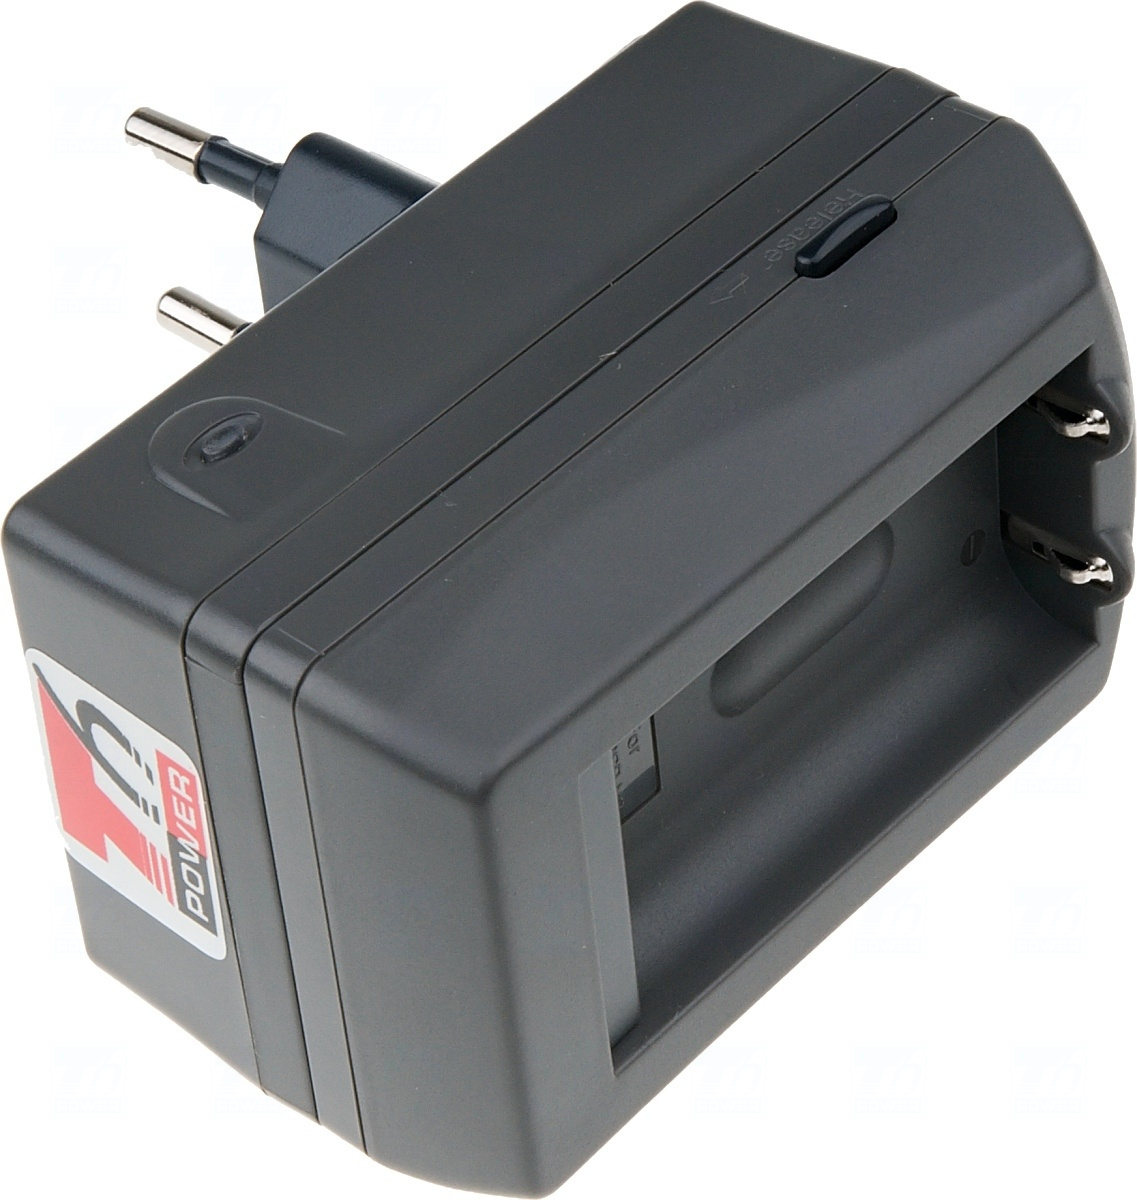 Nabíječka T6 power pro Nikon EN-EL23, 230V, 0,5A